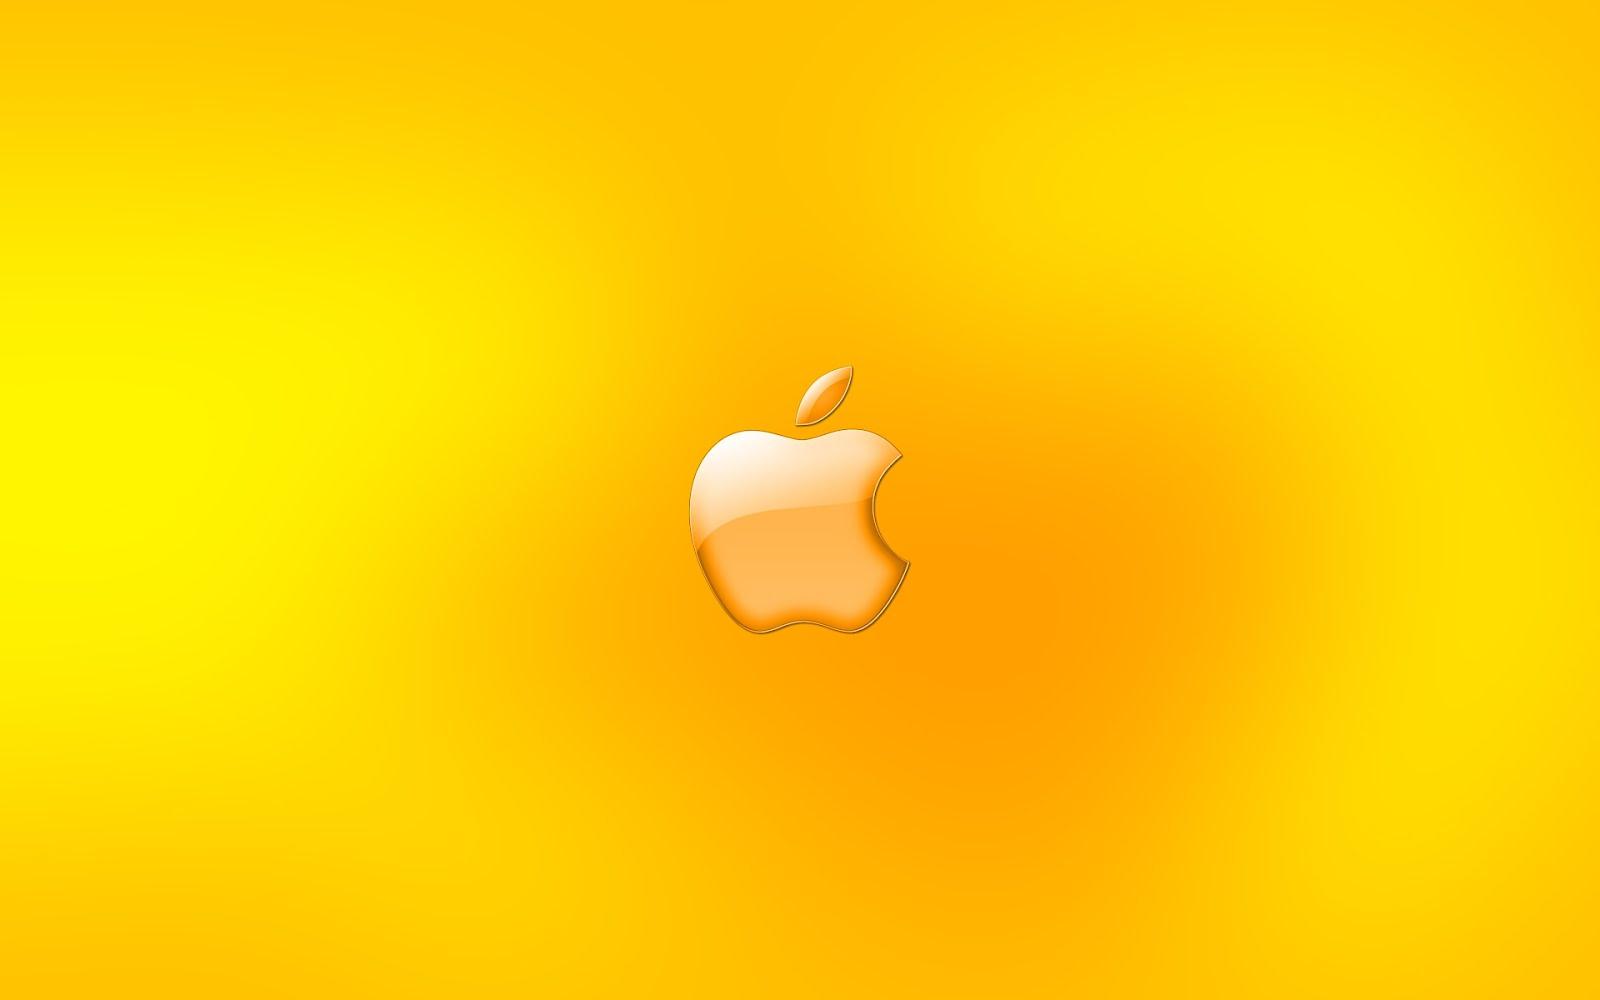 yellow wallpaper hd for desktop computer wallpaper free